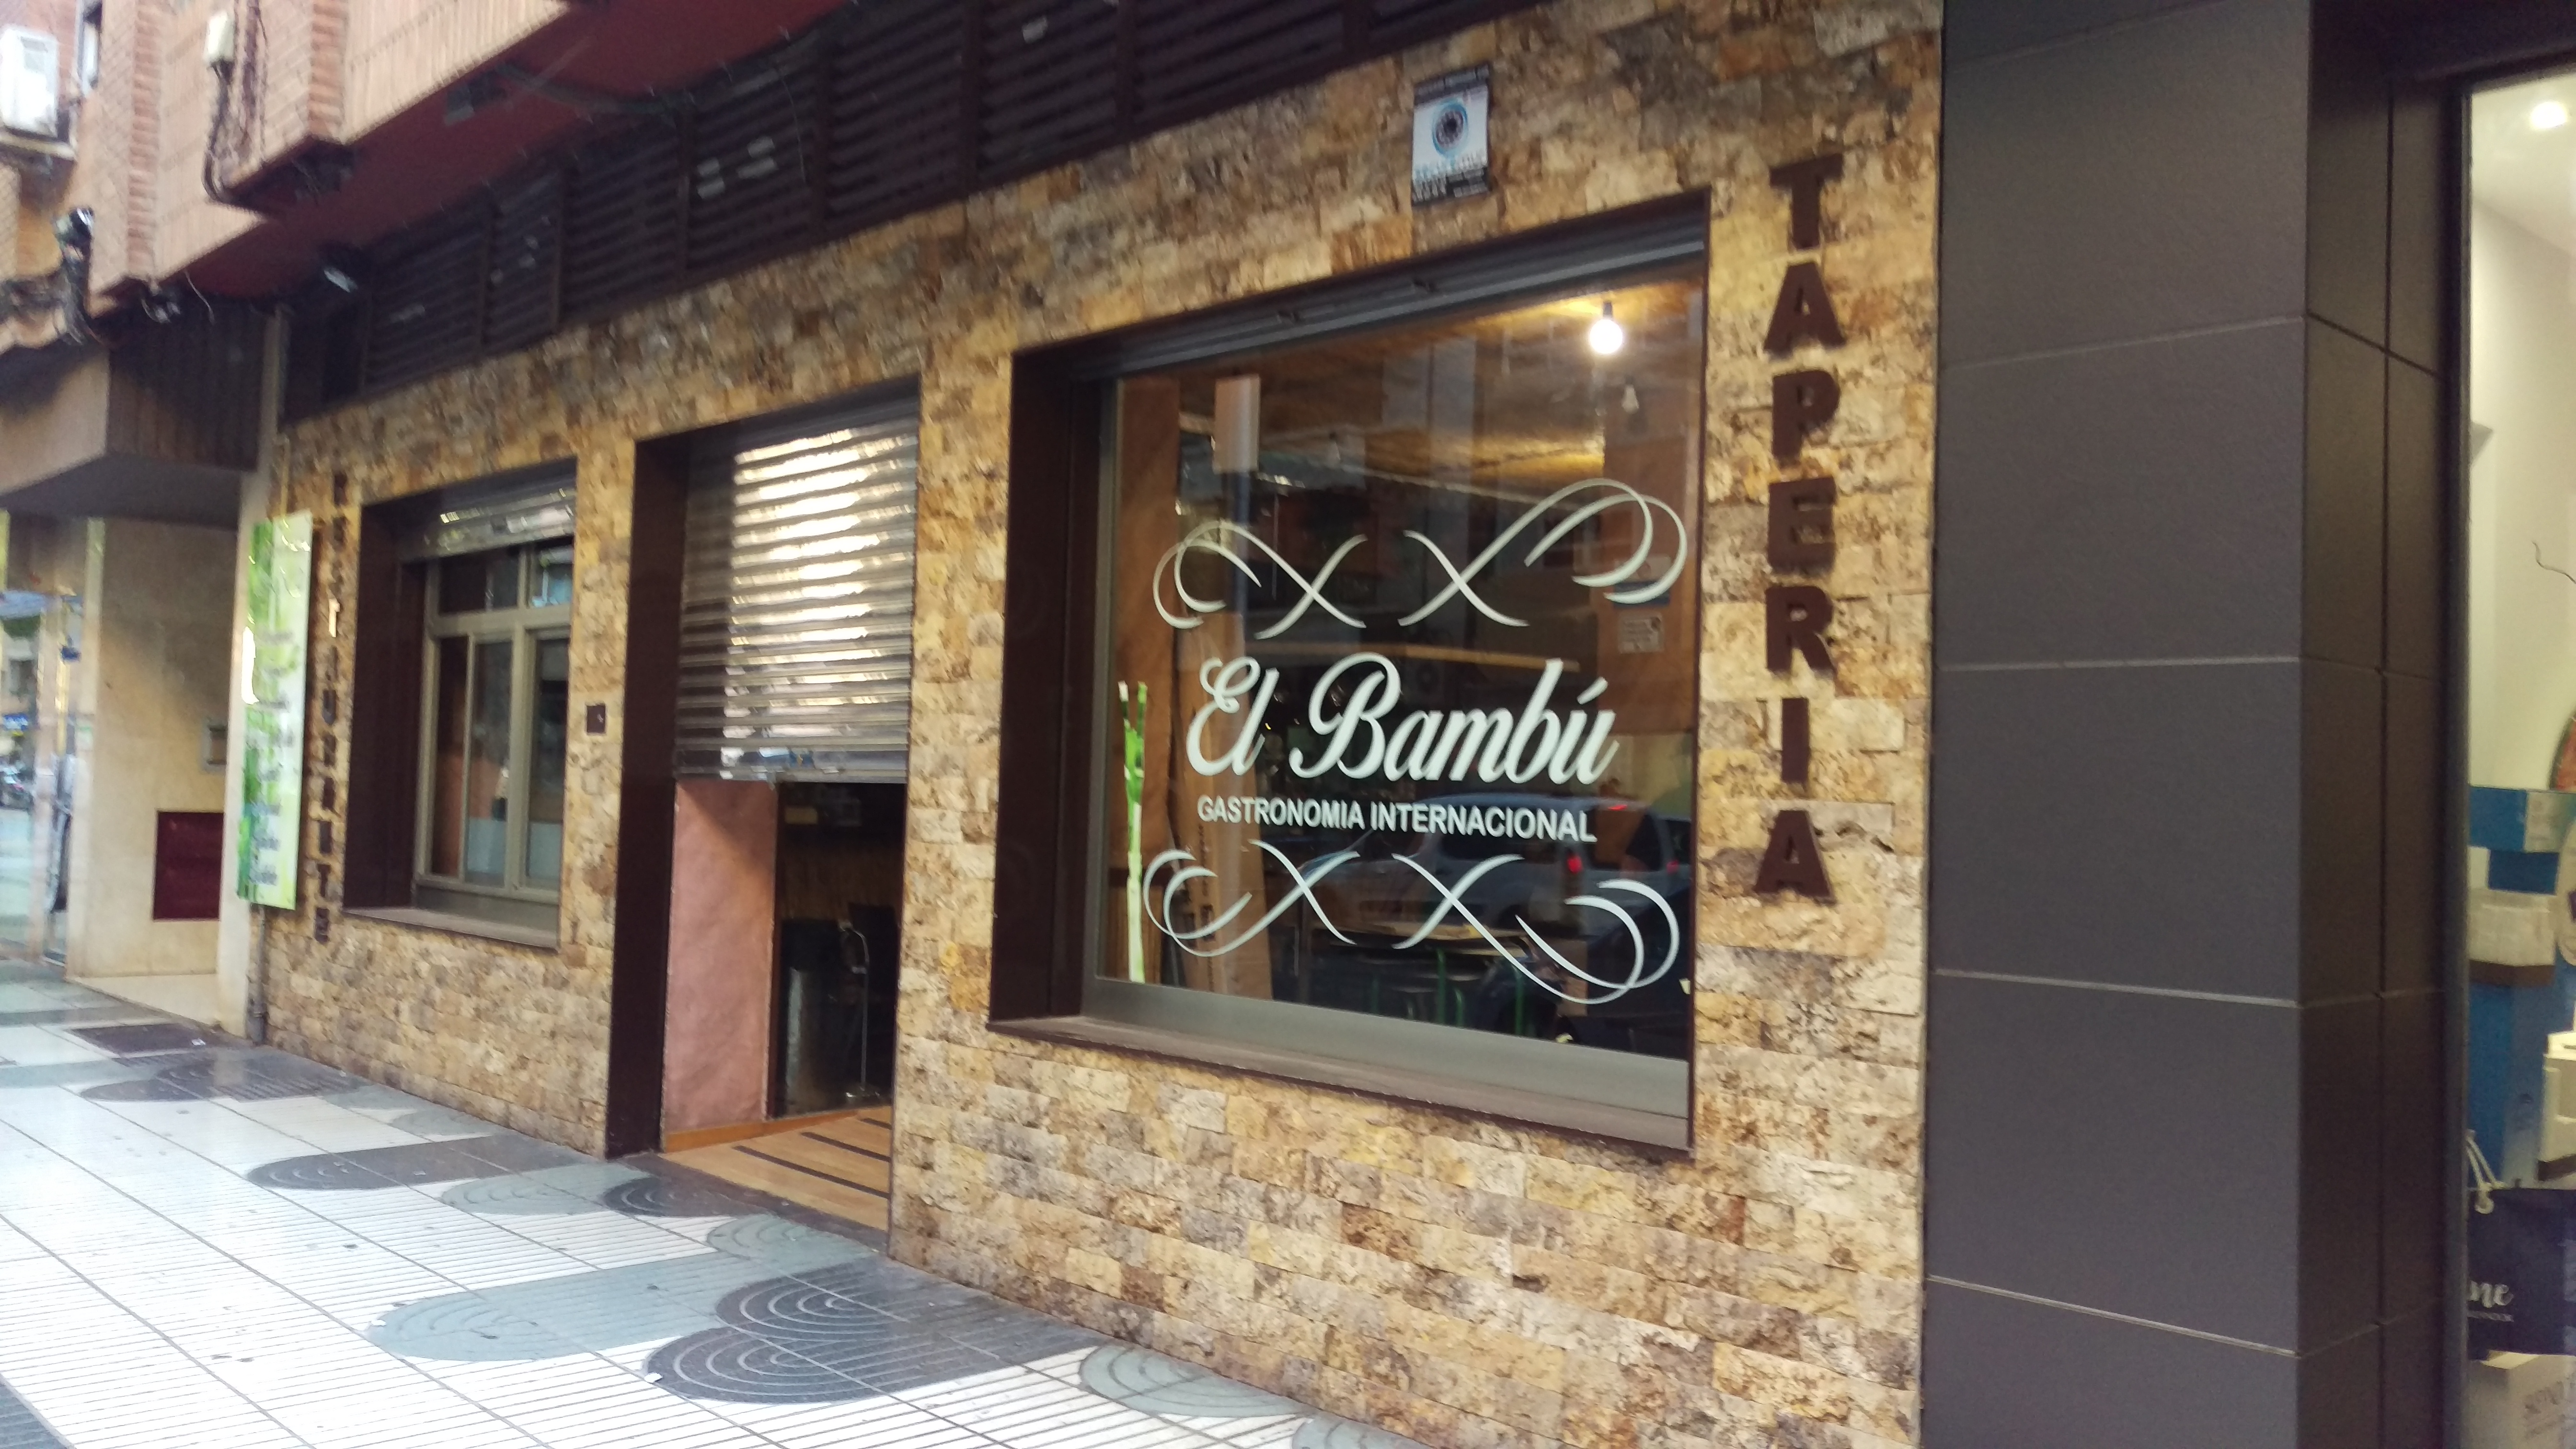 Próxima apertura RESTAURANTE EL BAMBÚ